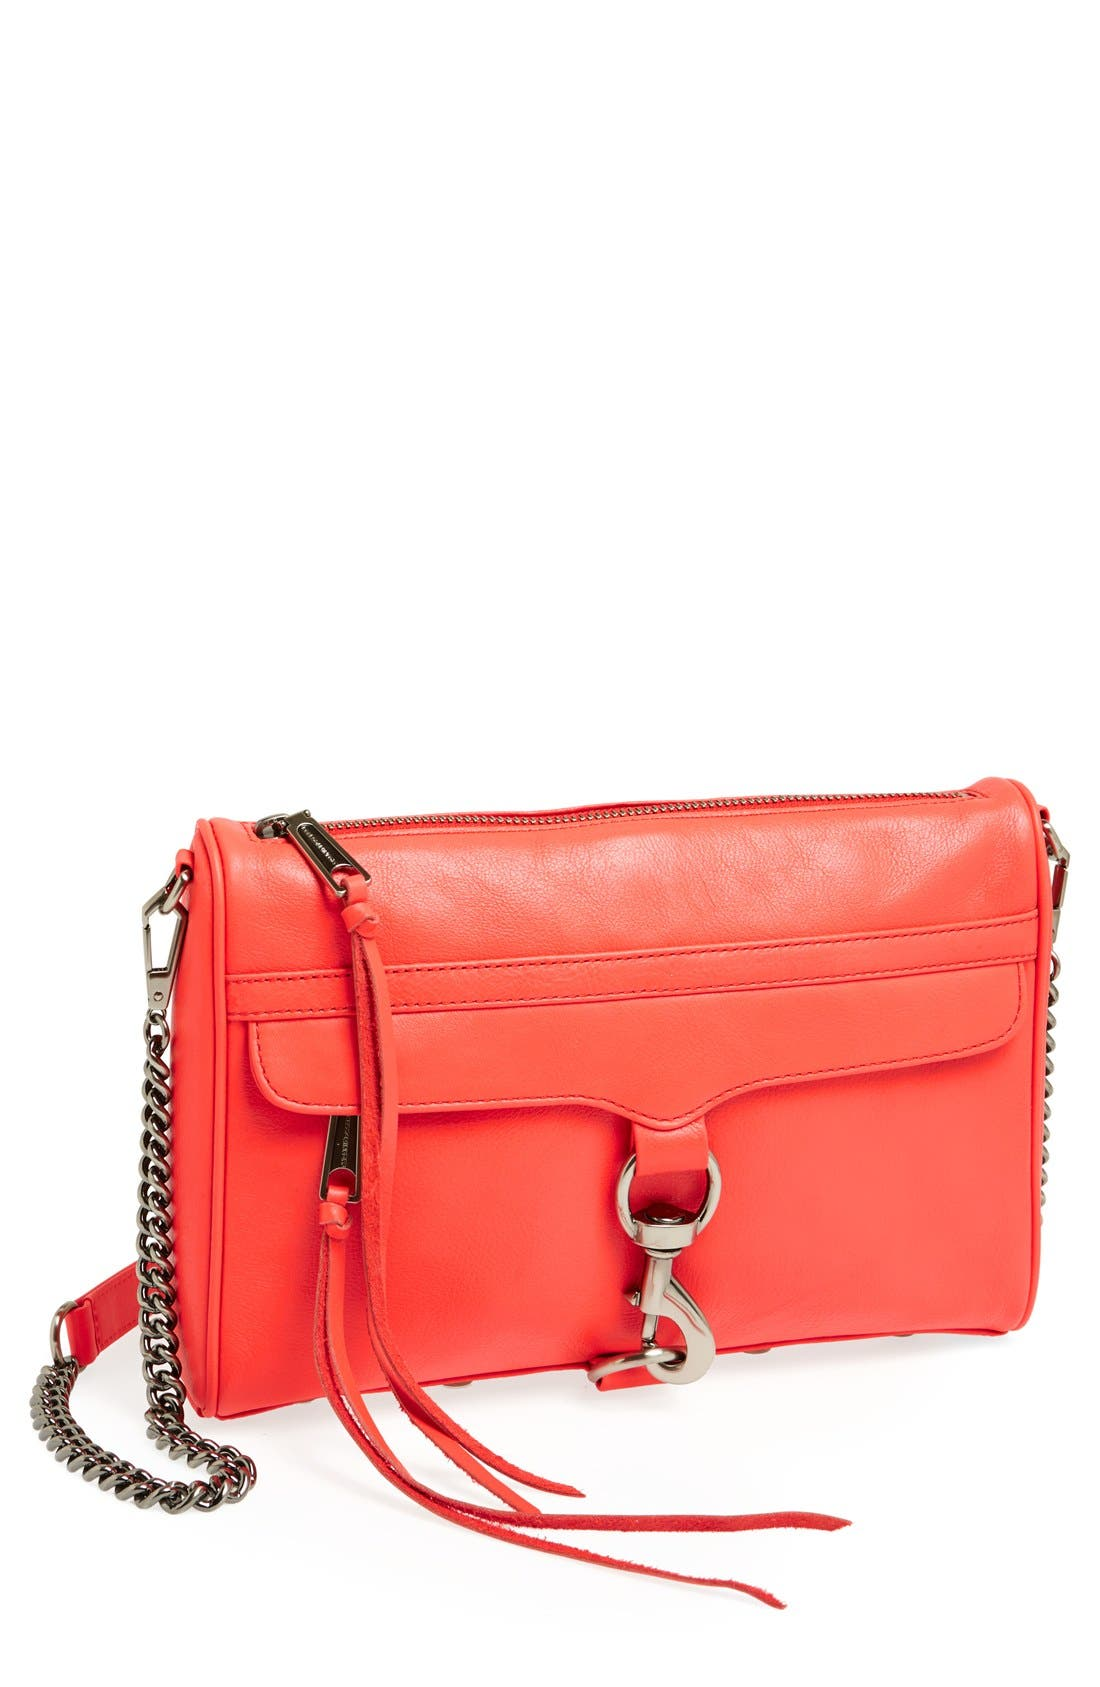 Alternate Image 1 Selected - Rebecca Minkoff 'MAC Clutch' Crossbody Bag